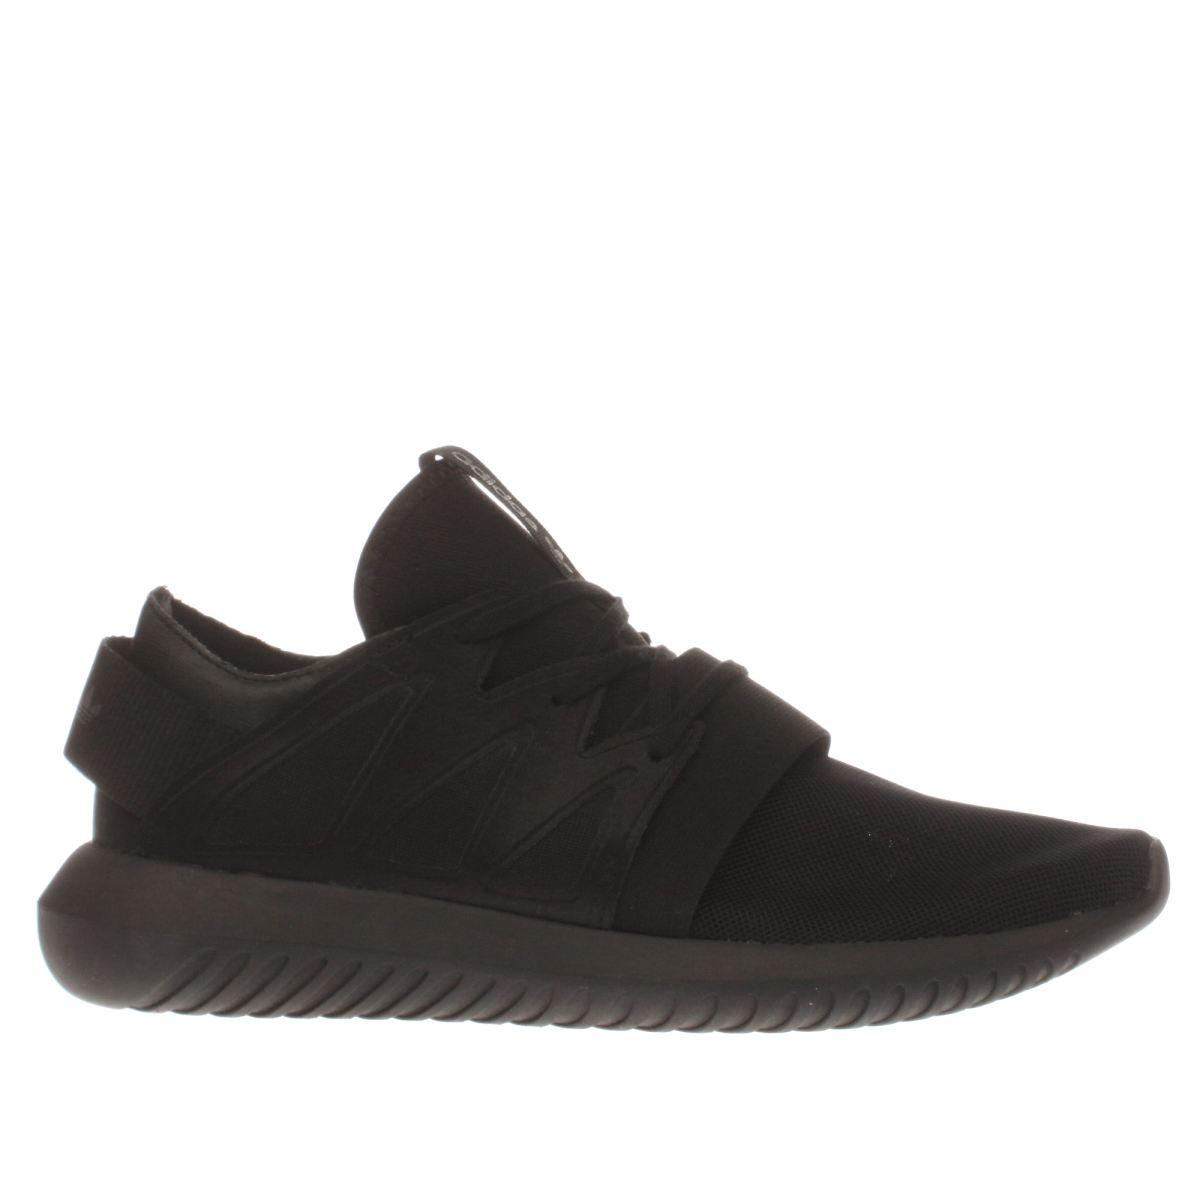 Adidas Tubular Womens Black